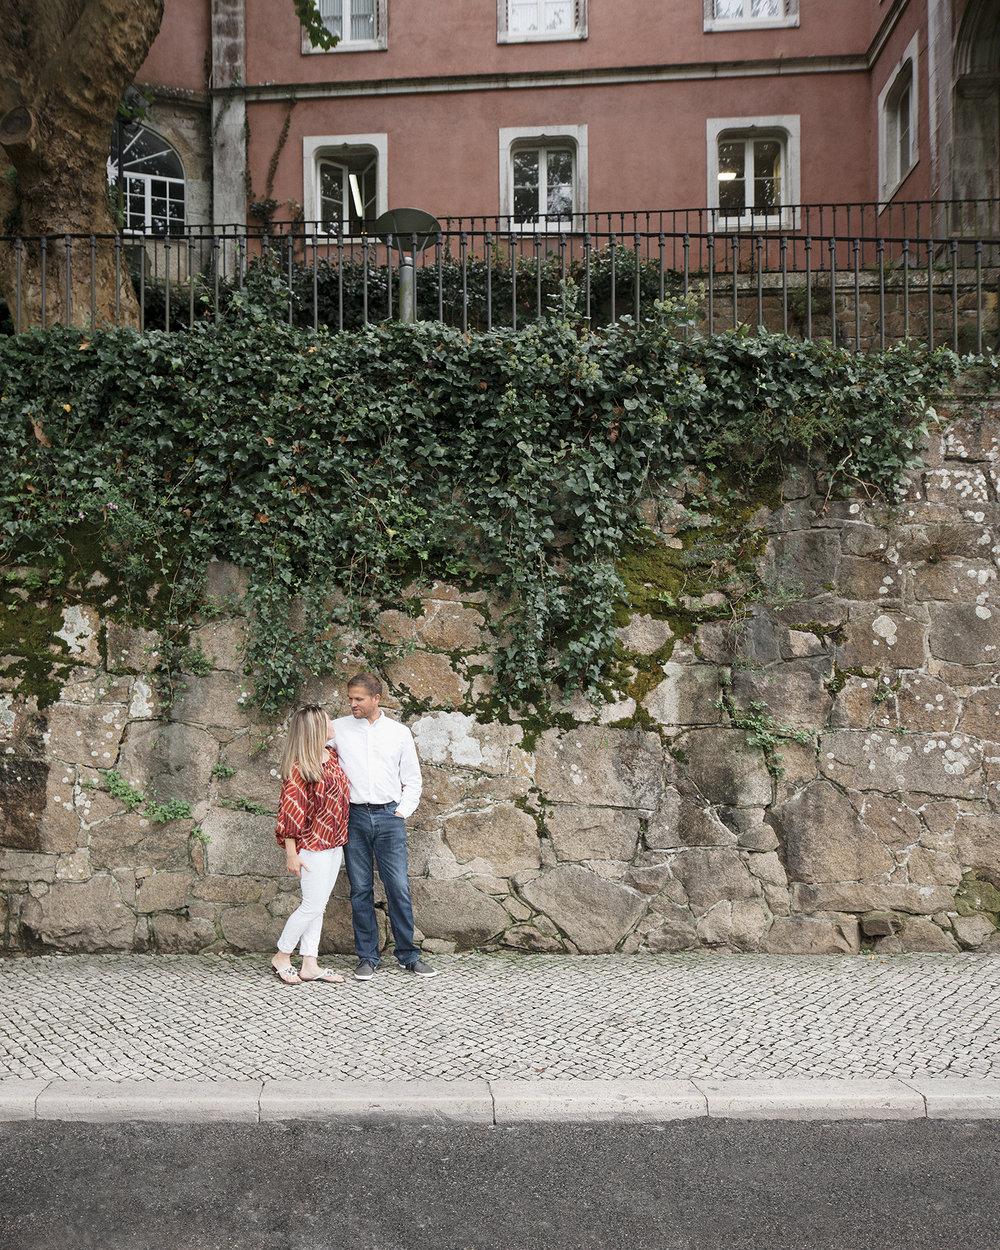 sessao-fotografica-casal-sintra-portugal-flytographer-terra-fotografia-04.jpg